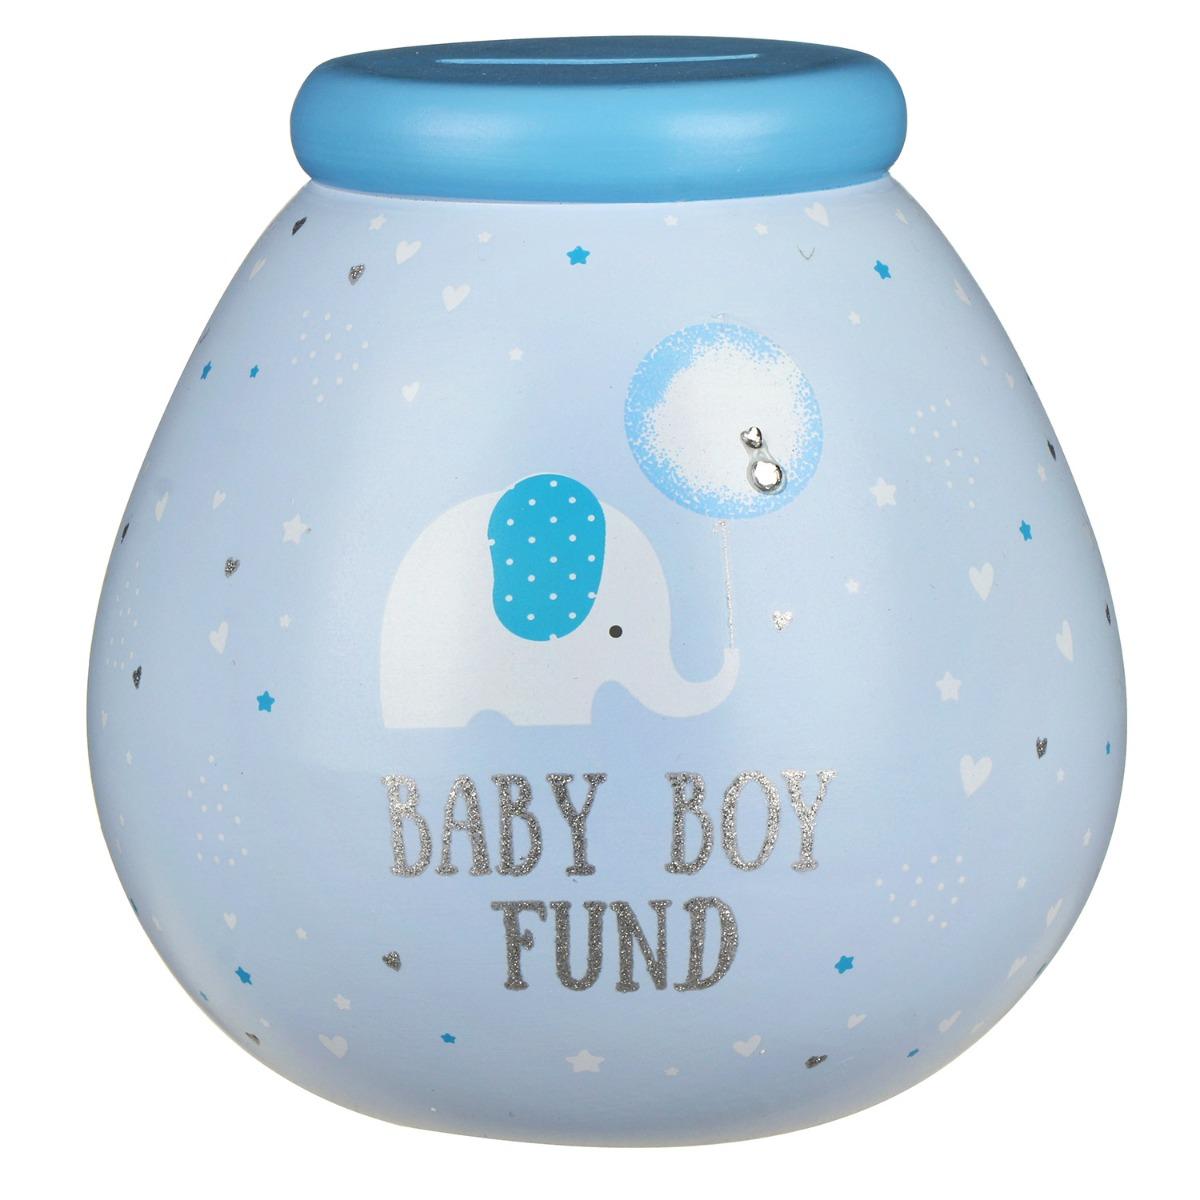 Pot of Dreams Little Elephant Baby Boy Fund Money Pot